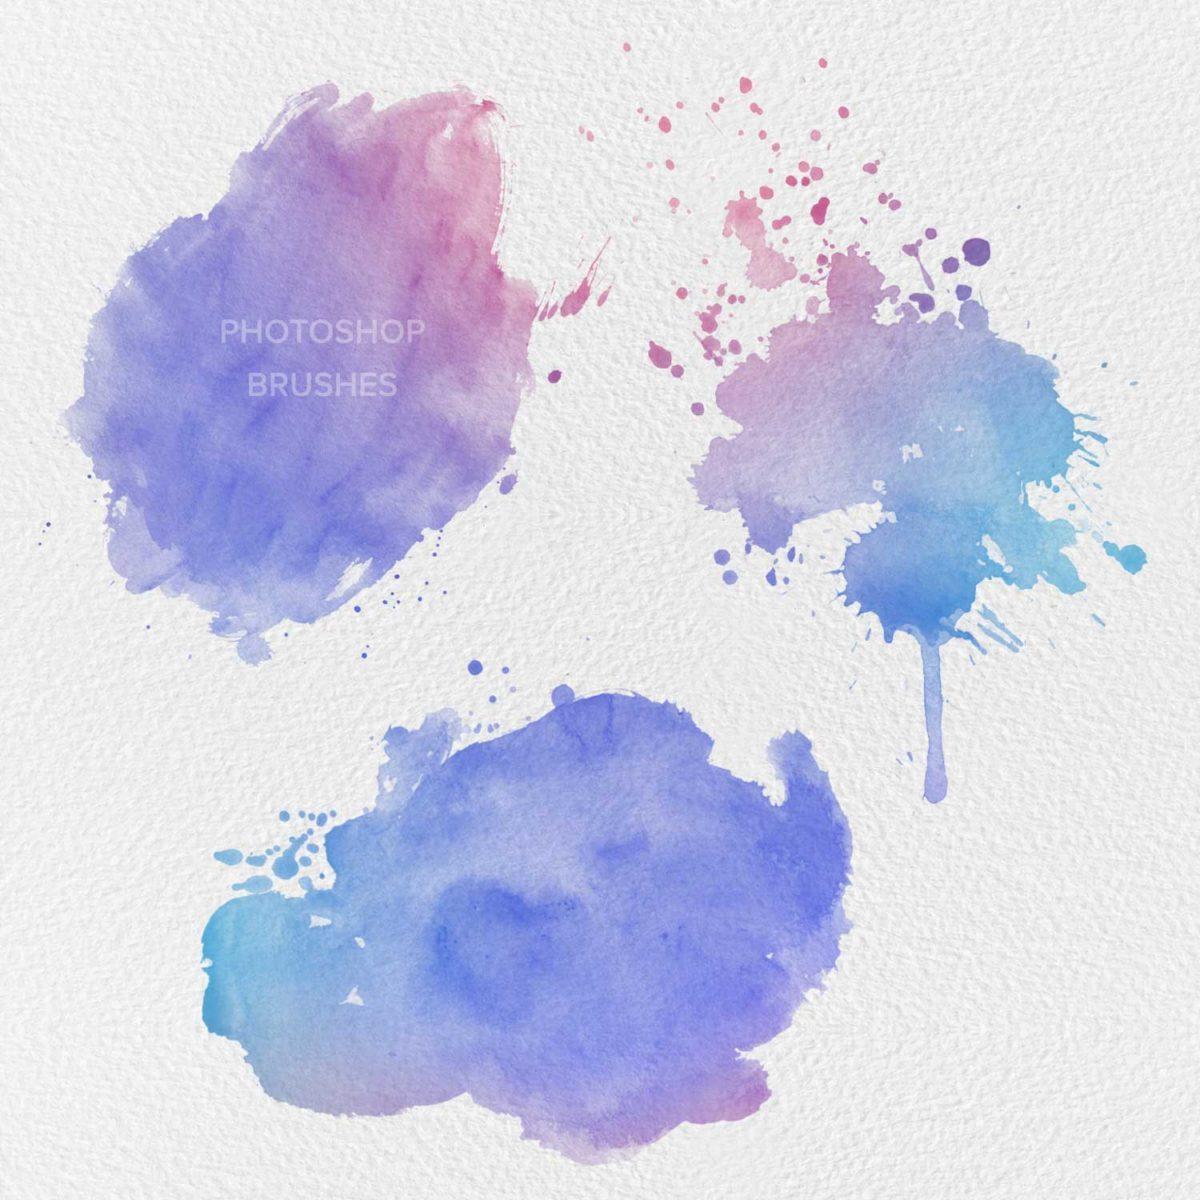 Aqua Watercolor Photoshop Brushes